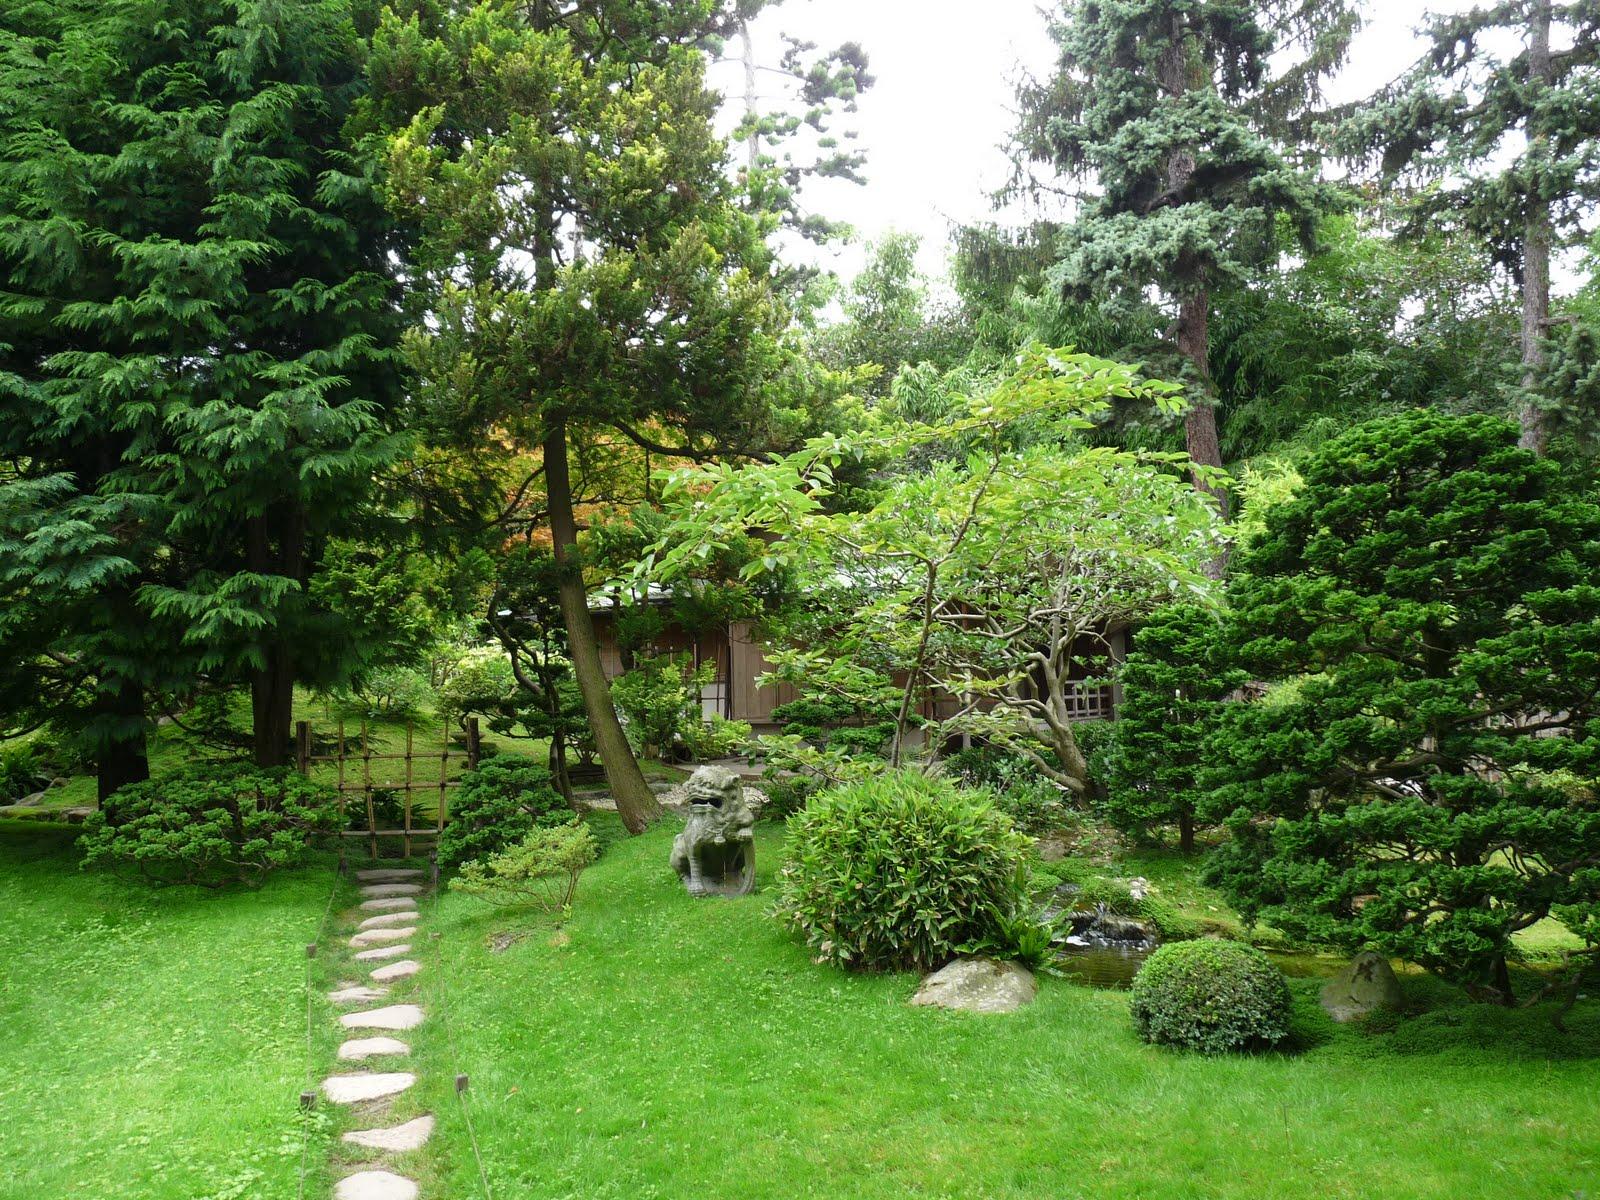 Mes autres carnets jardins albert kahn for Grand jardin en friche